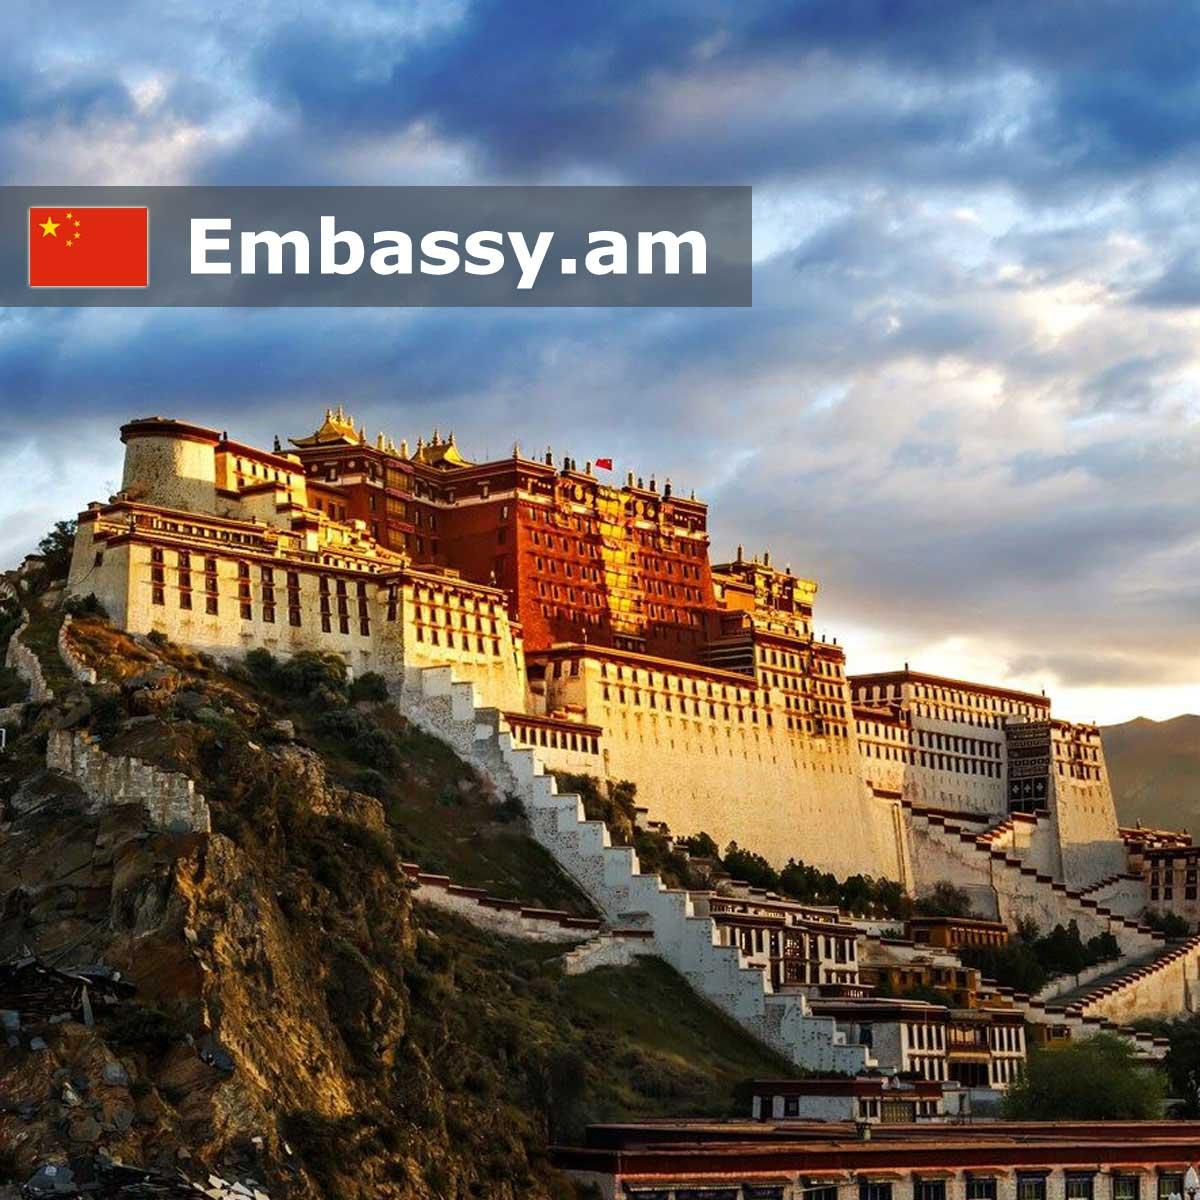 Lhasa - Hotels in China - Embassy.am